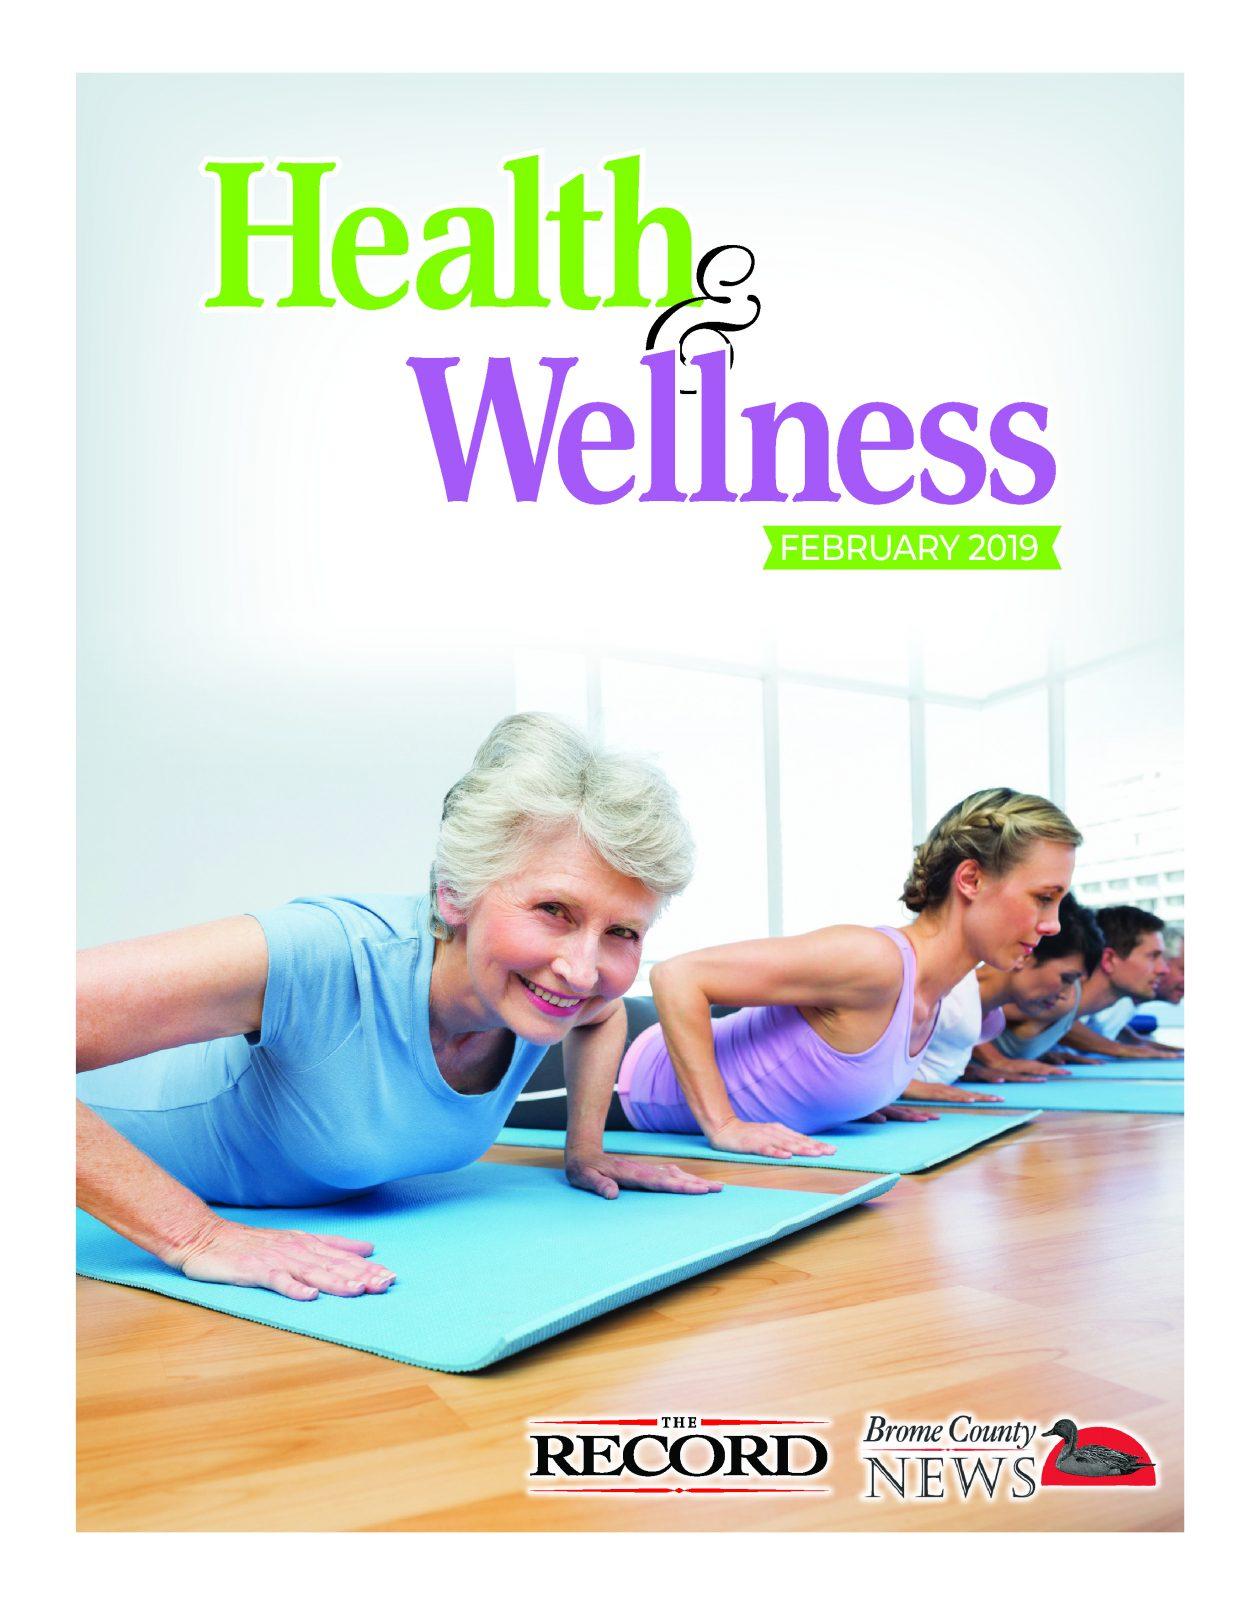 Health and Wellness – February 2019